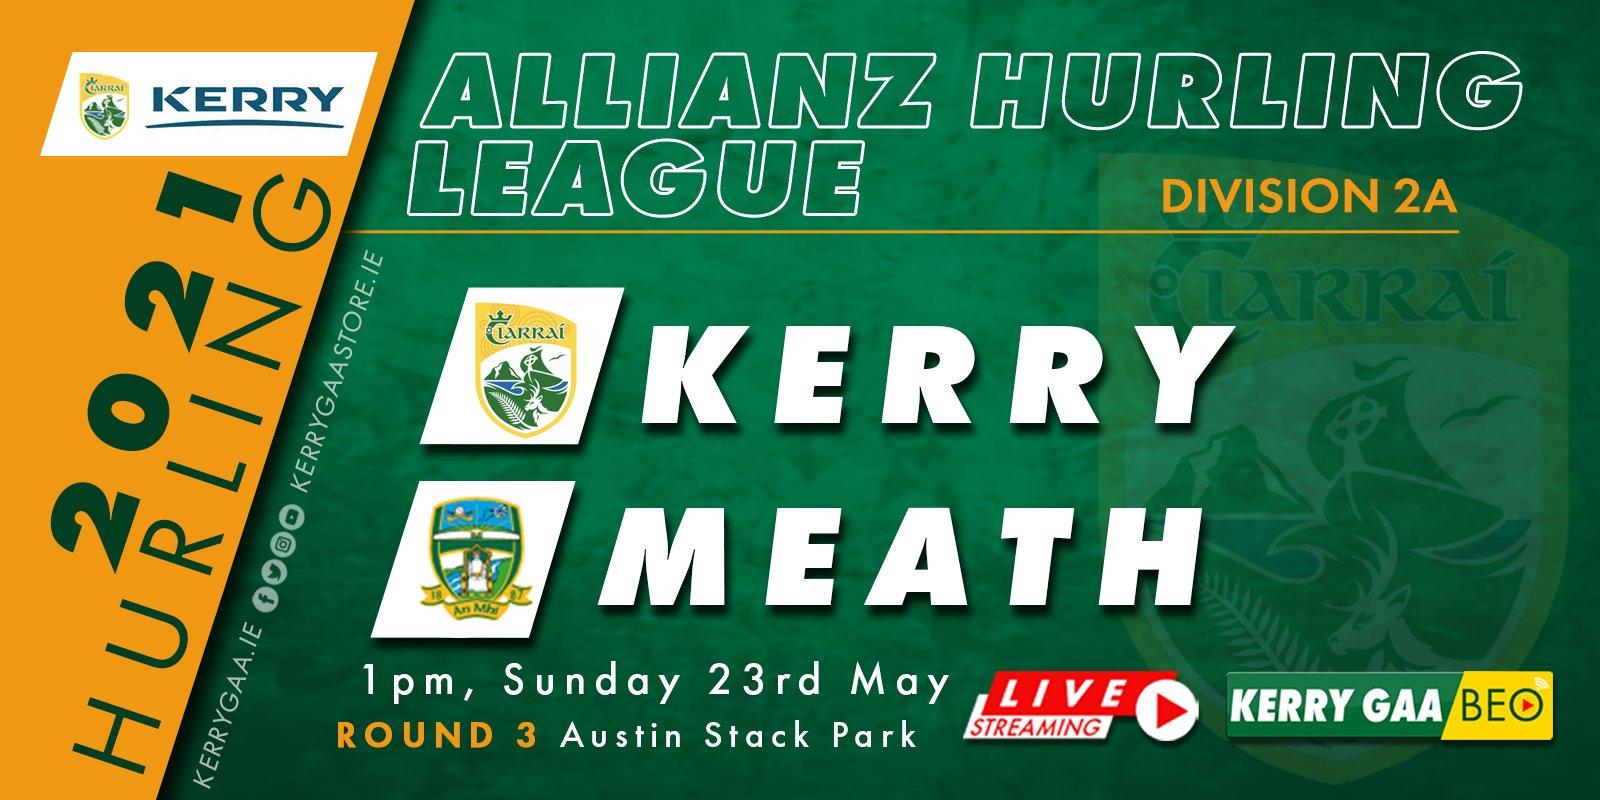 Match Programme: Kerry vs Meath